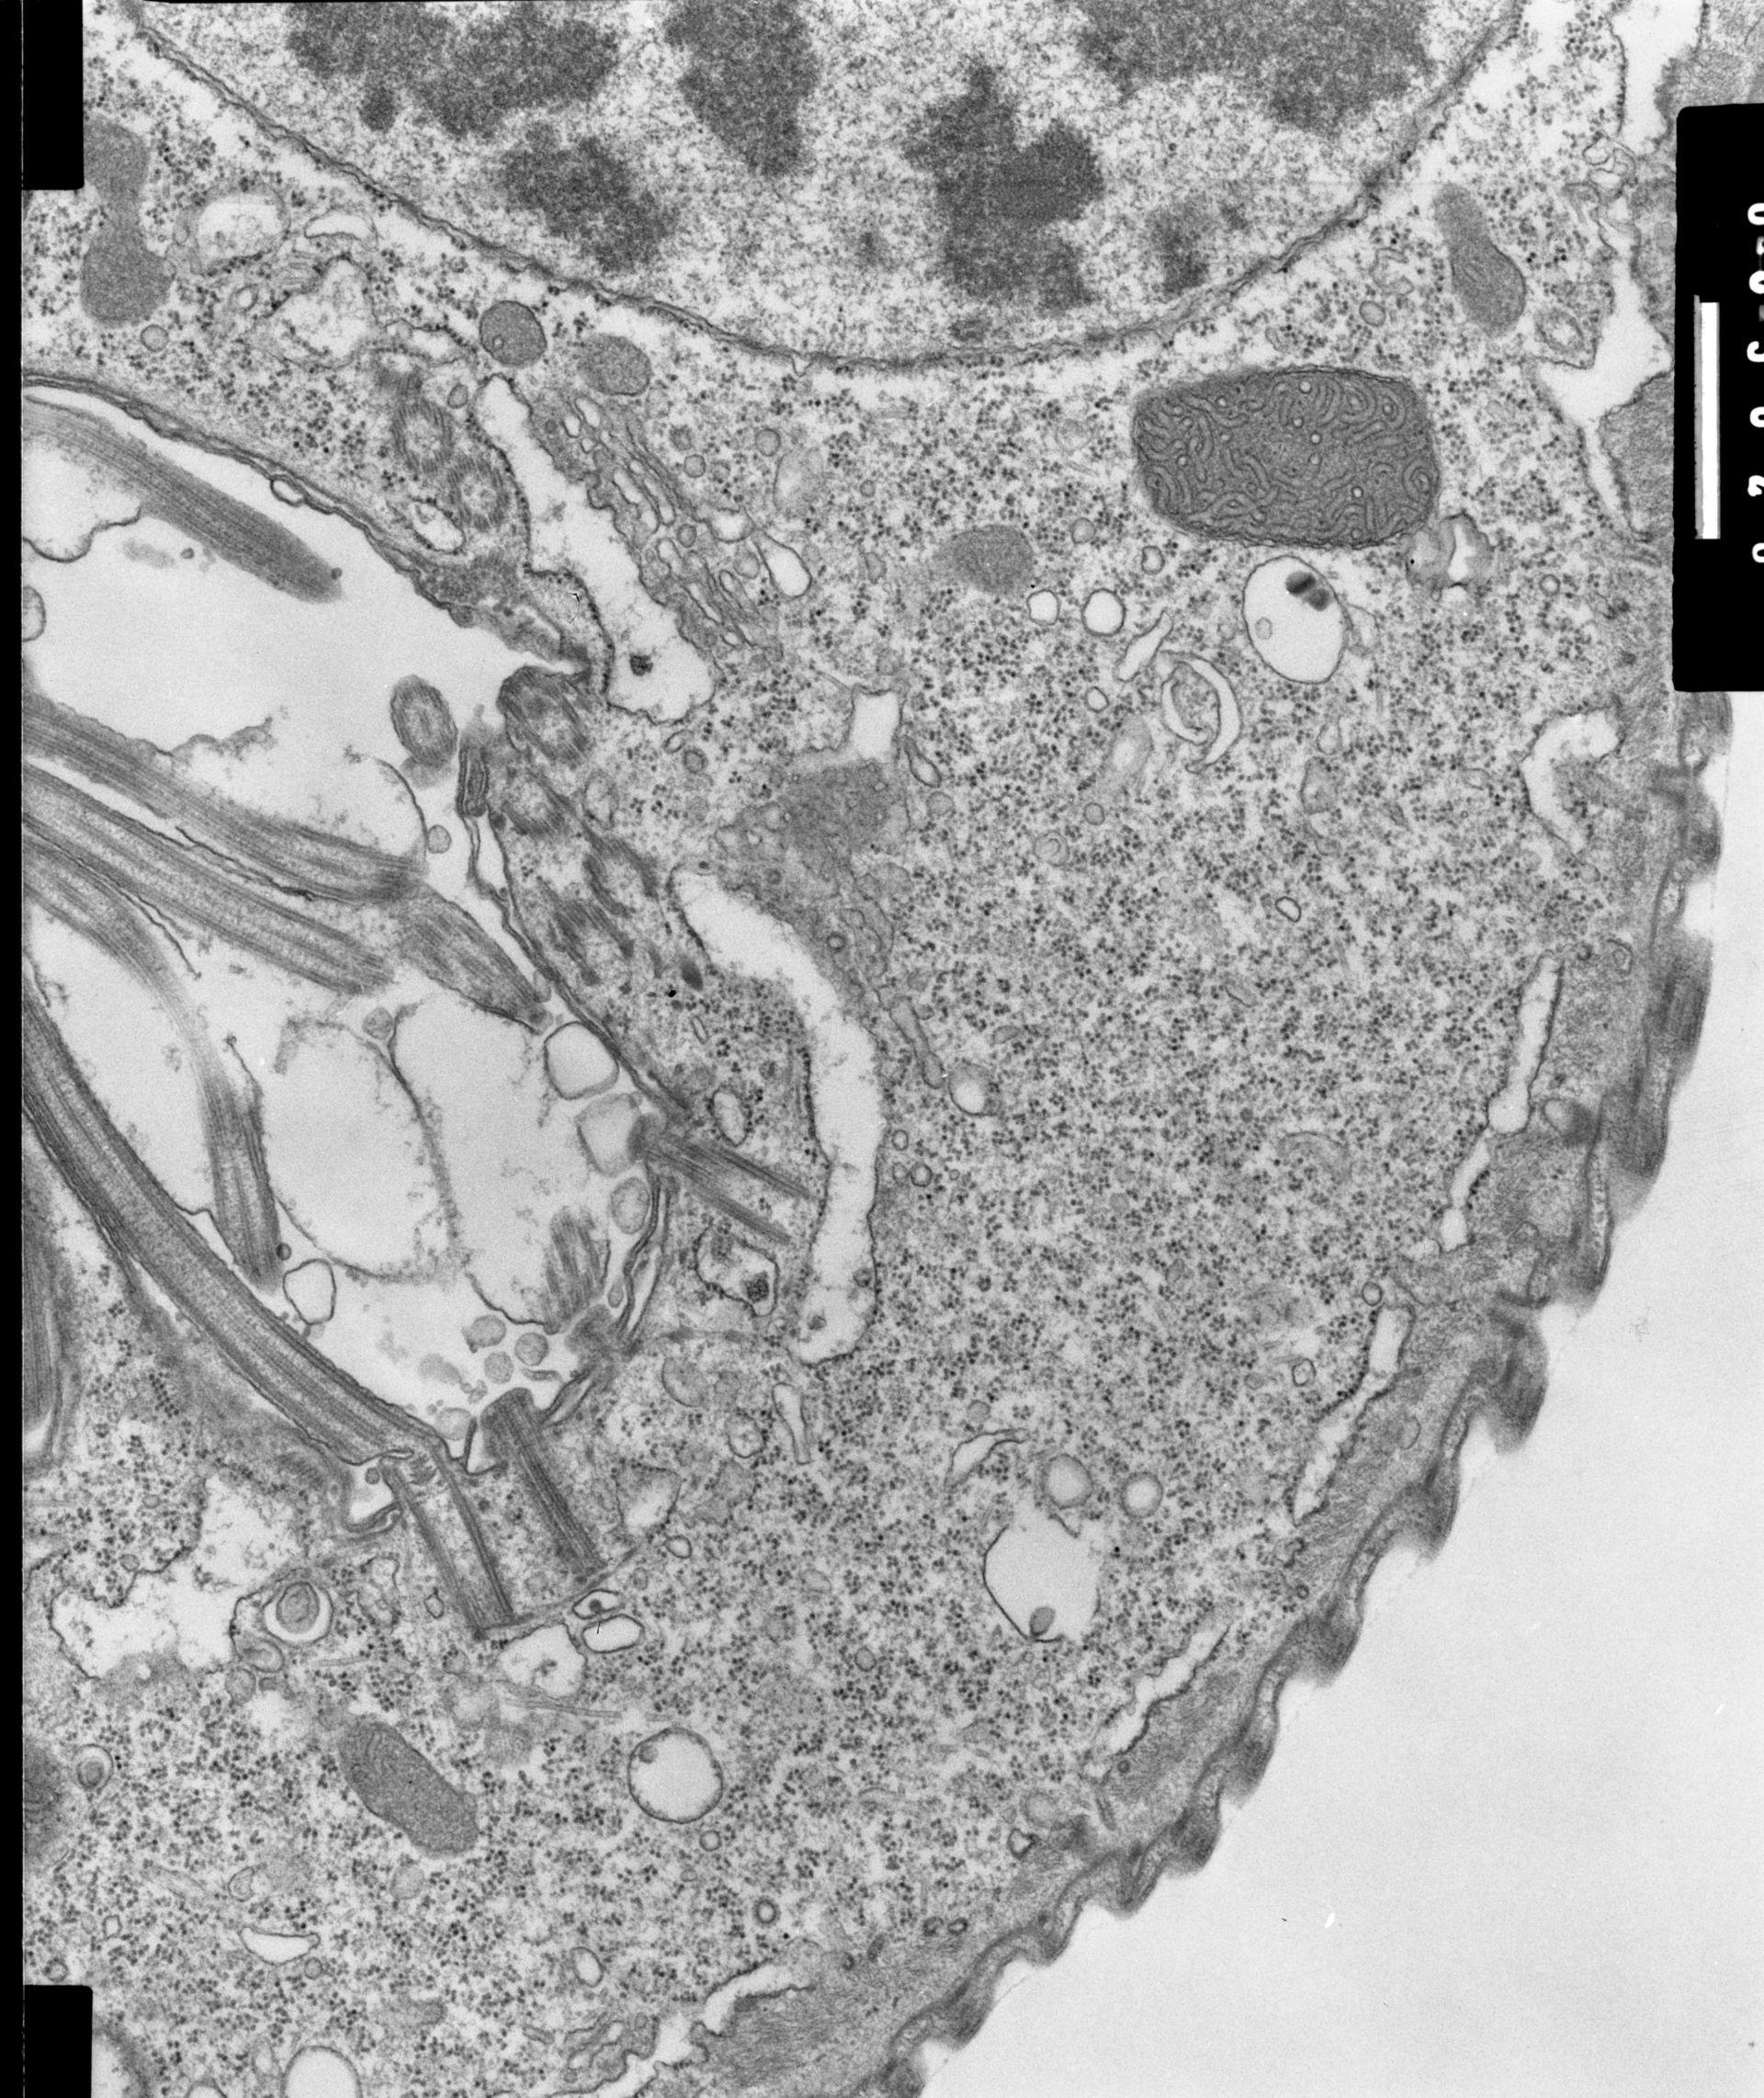 Opercularia coarctata (Golgi) - CIL:7339